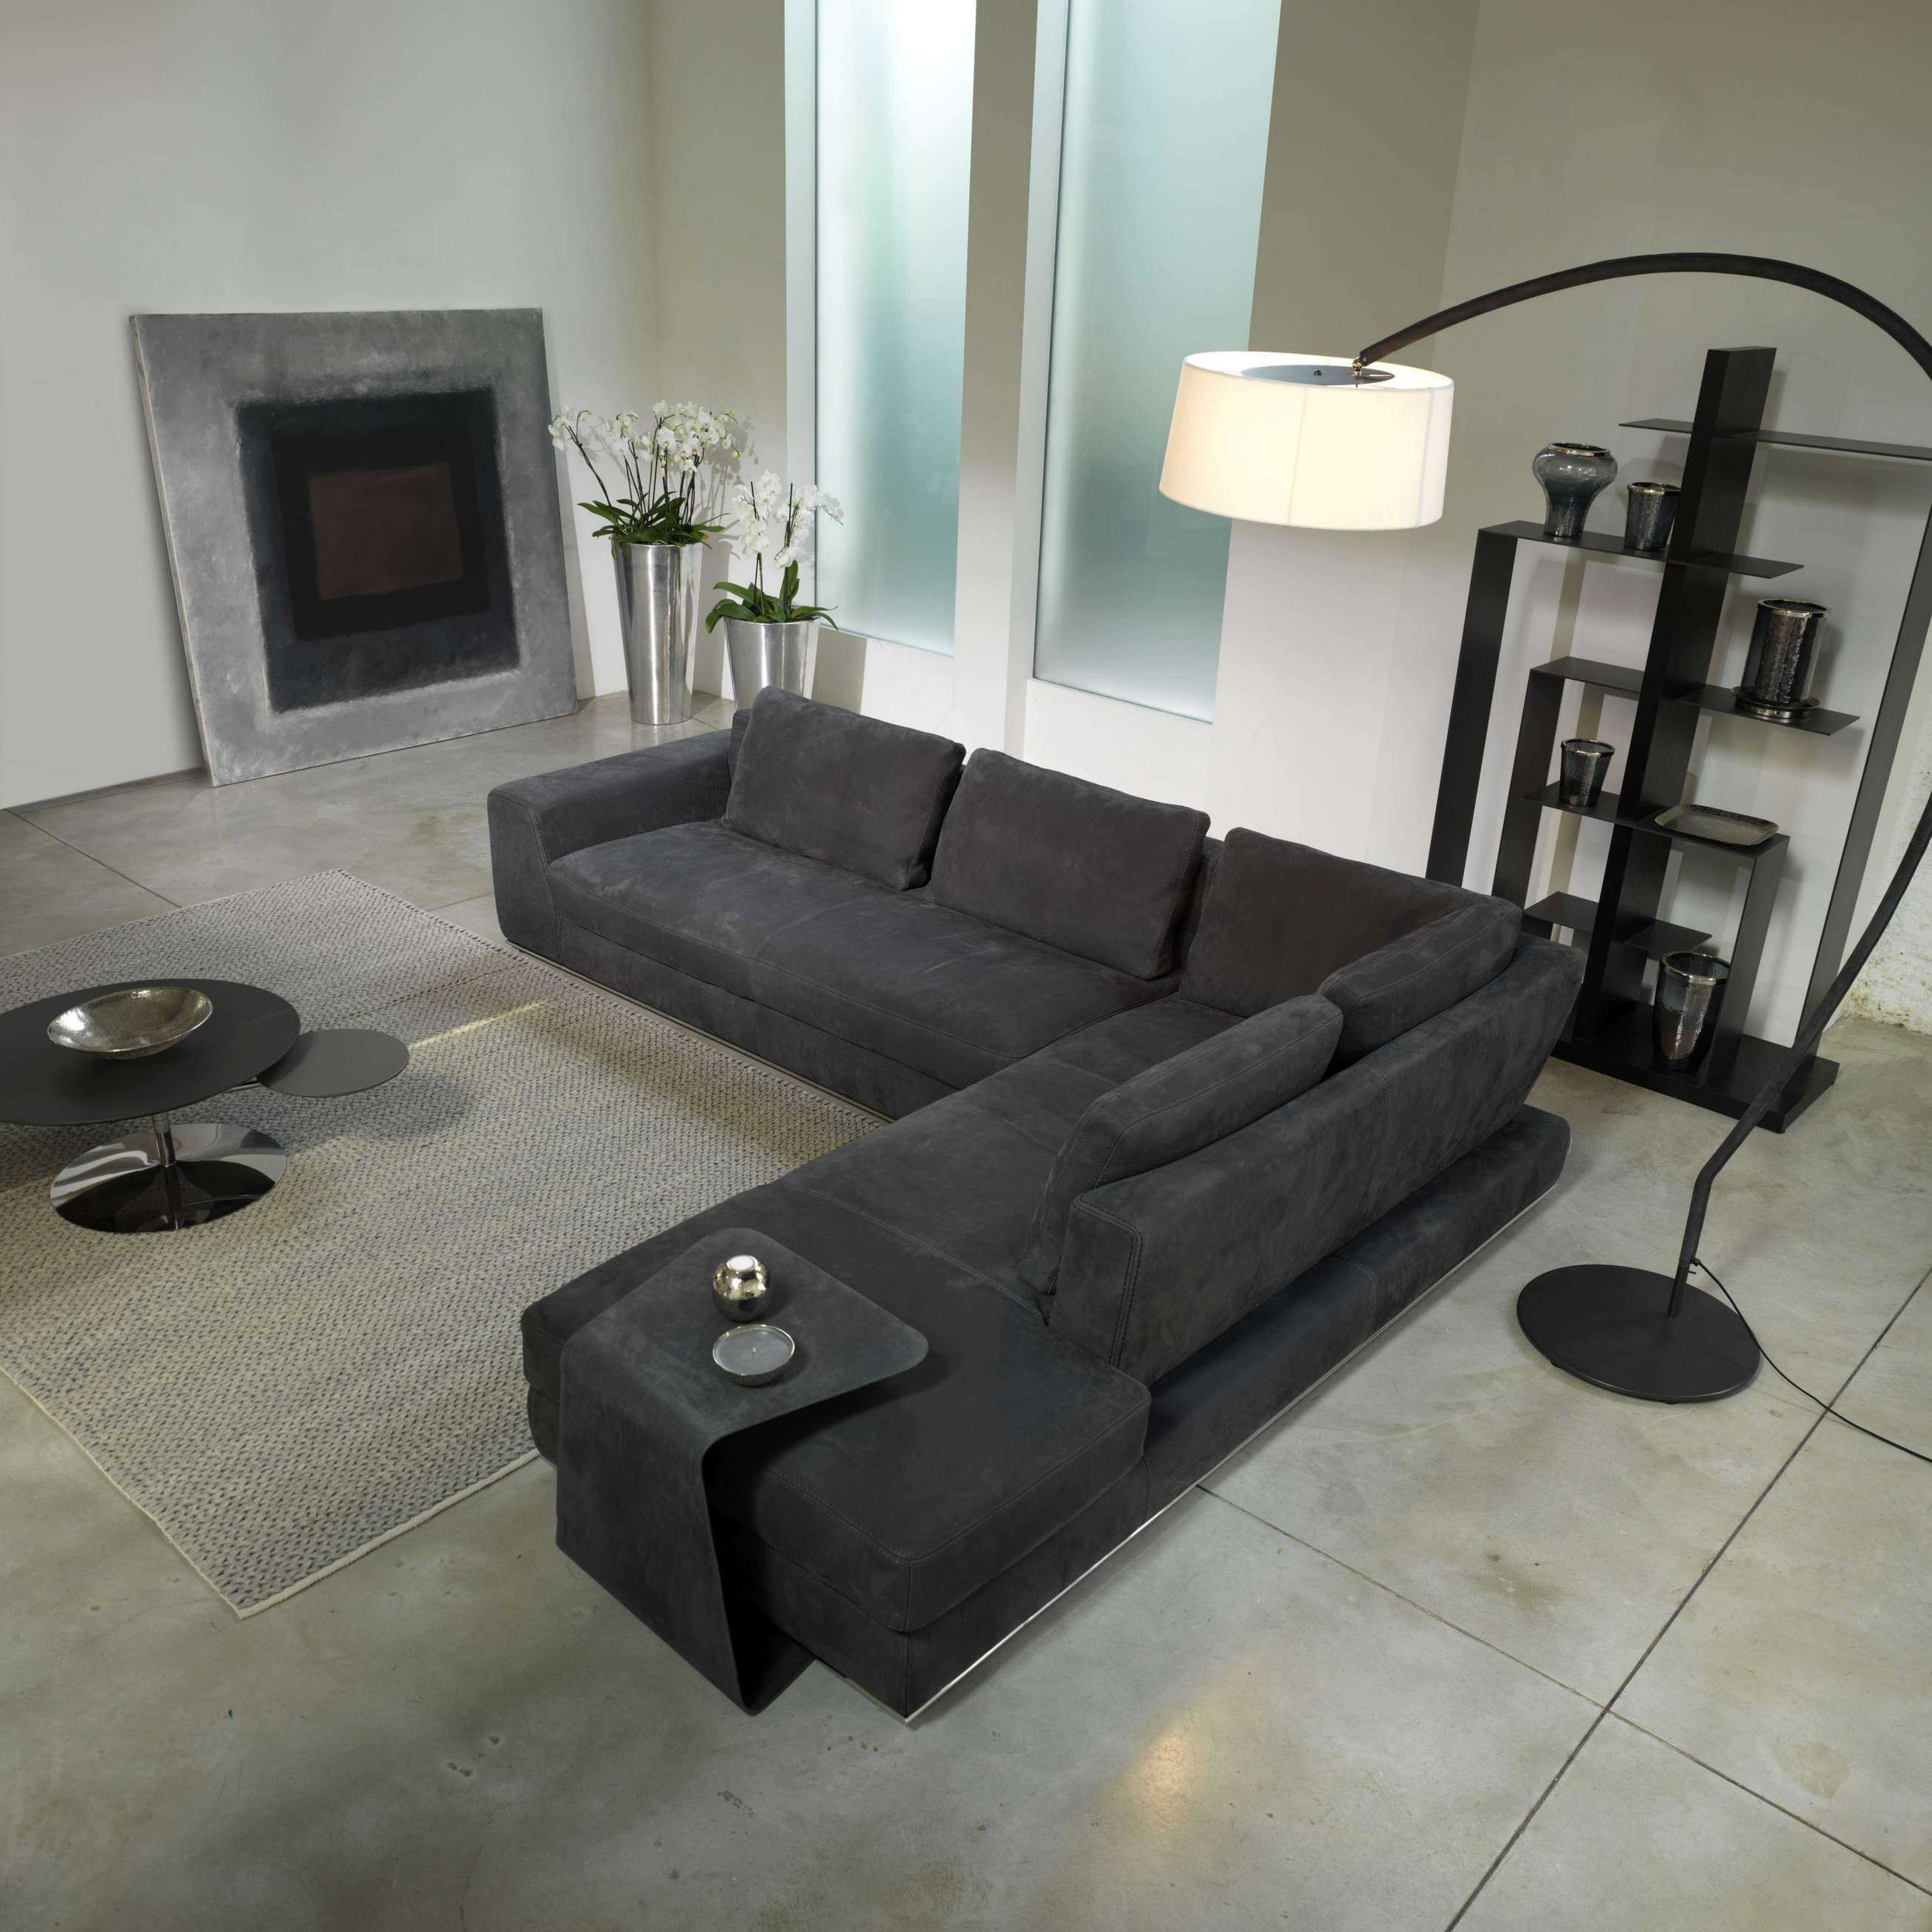 Summer A Modern Luxury Sofa By Cierre Imbottiti Designed By Stefano Conficconi Modern Bedroom Furniture Furniture Luxury Sofa